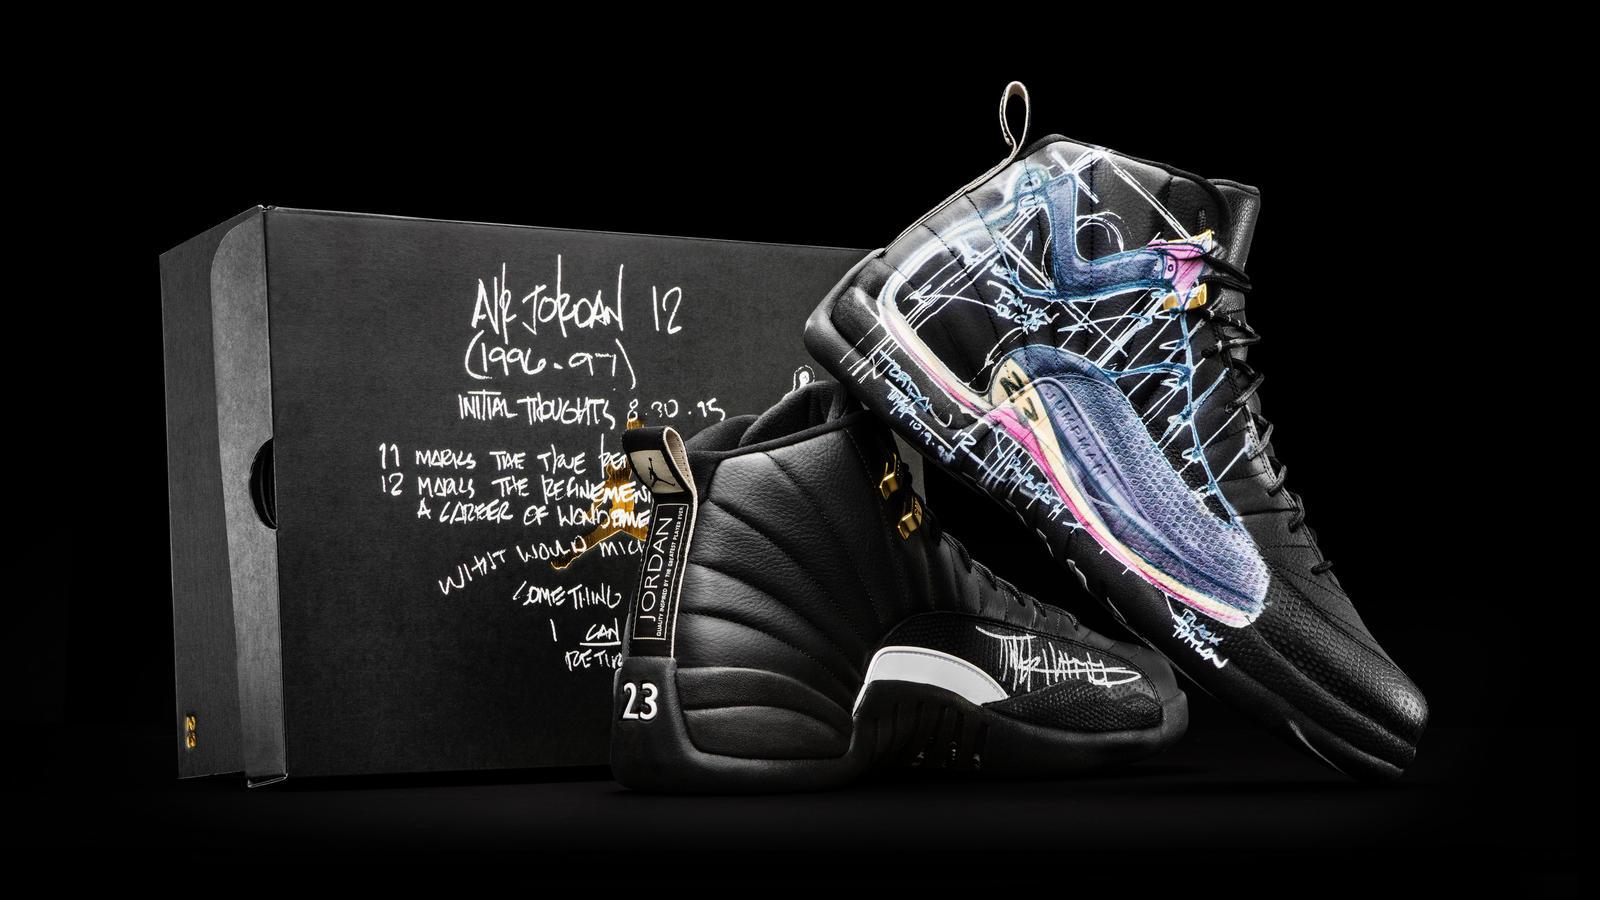 Nike_doernbecher_ajs_one_pair_bonus_hd_1600